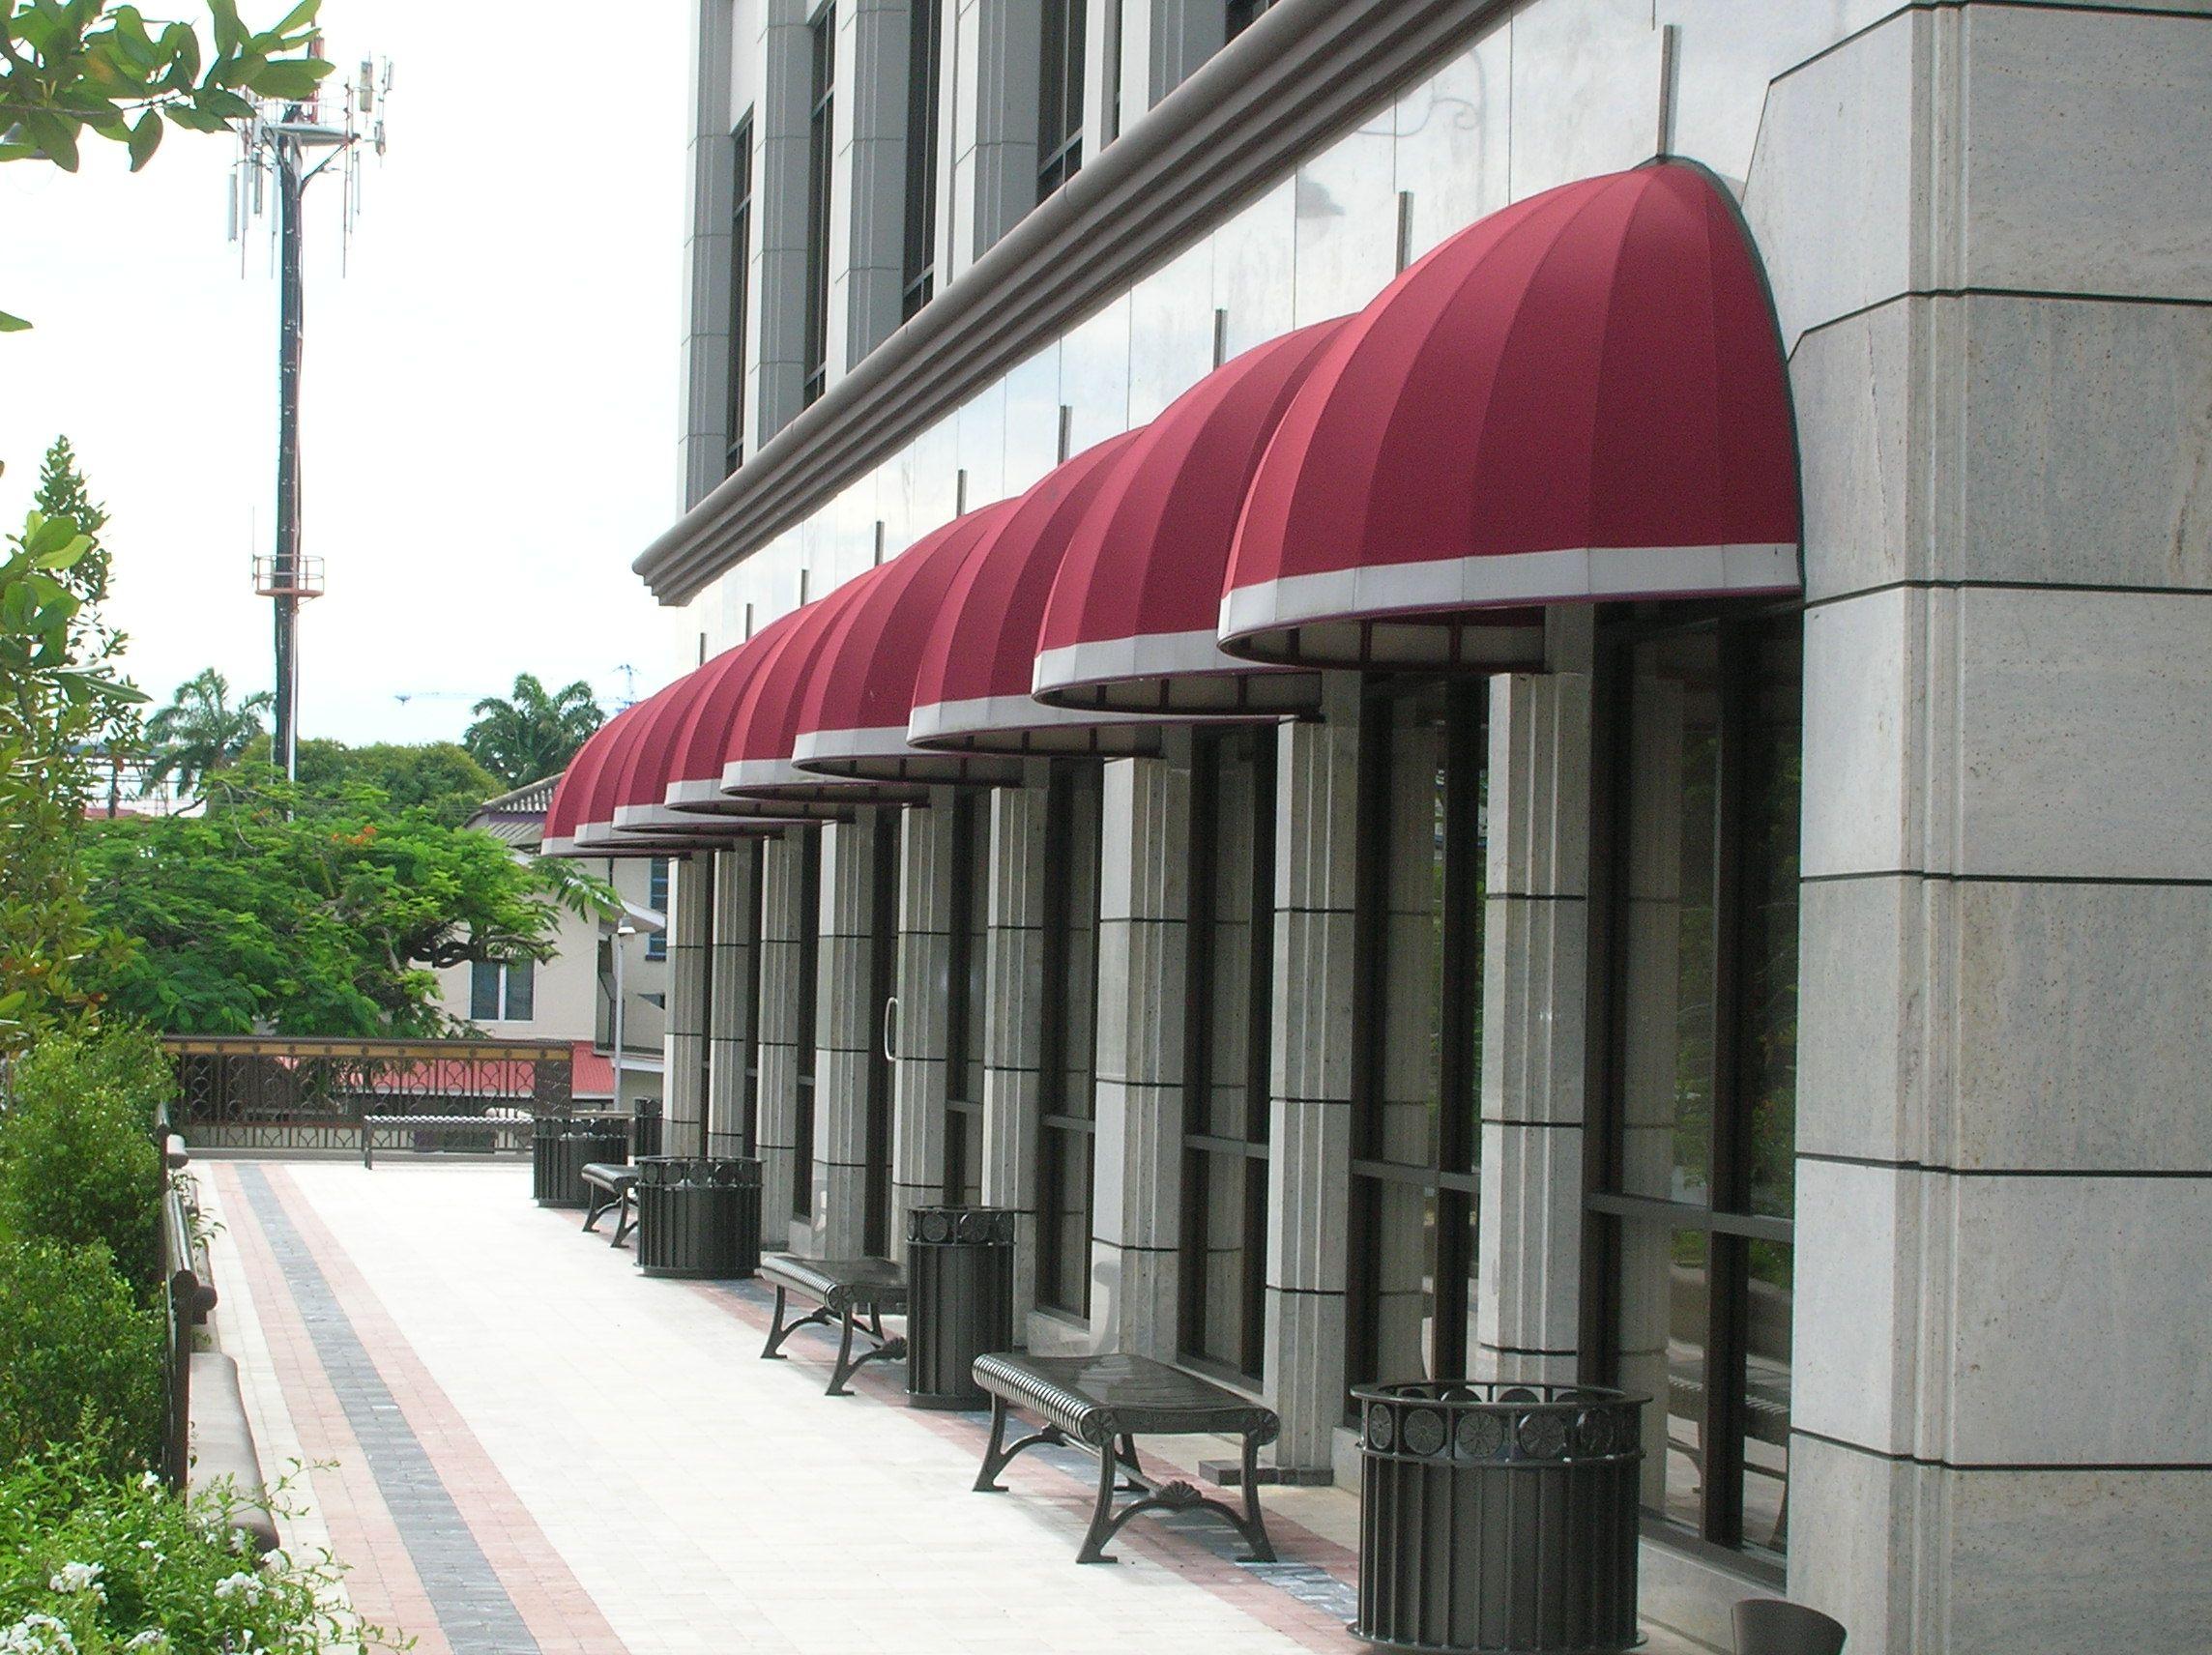 awning place briar fabric sunbrella pin cover dome trinidad